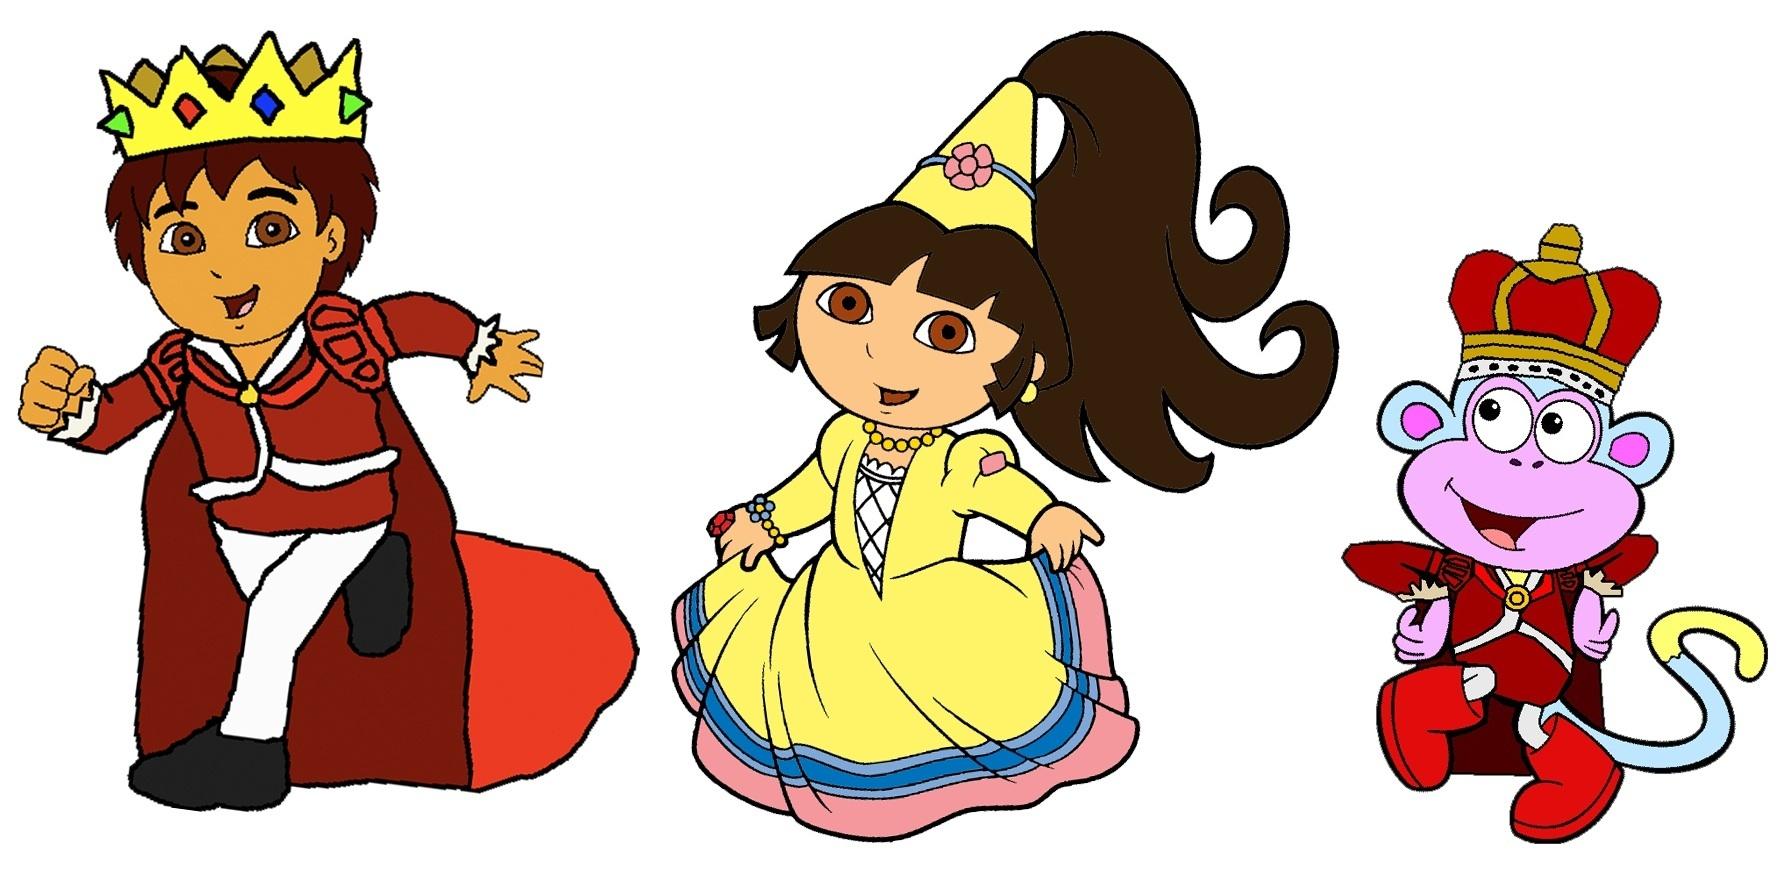 Prince Diego, Princess Dora and Prince Boots.